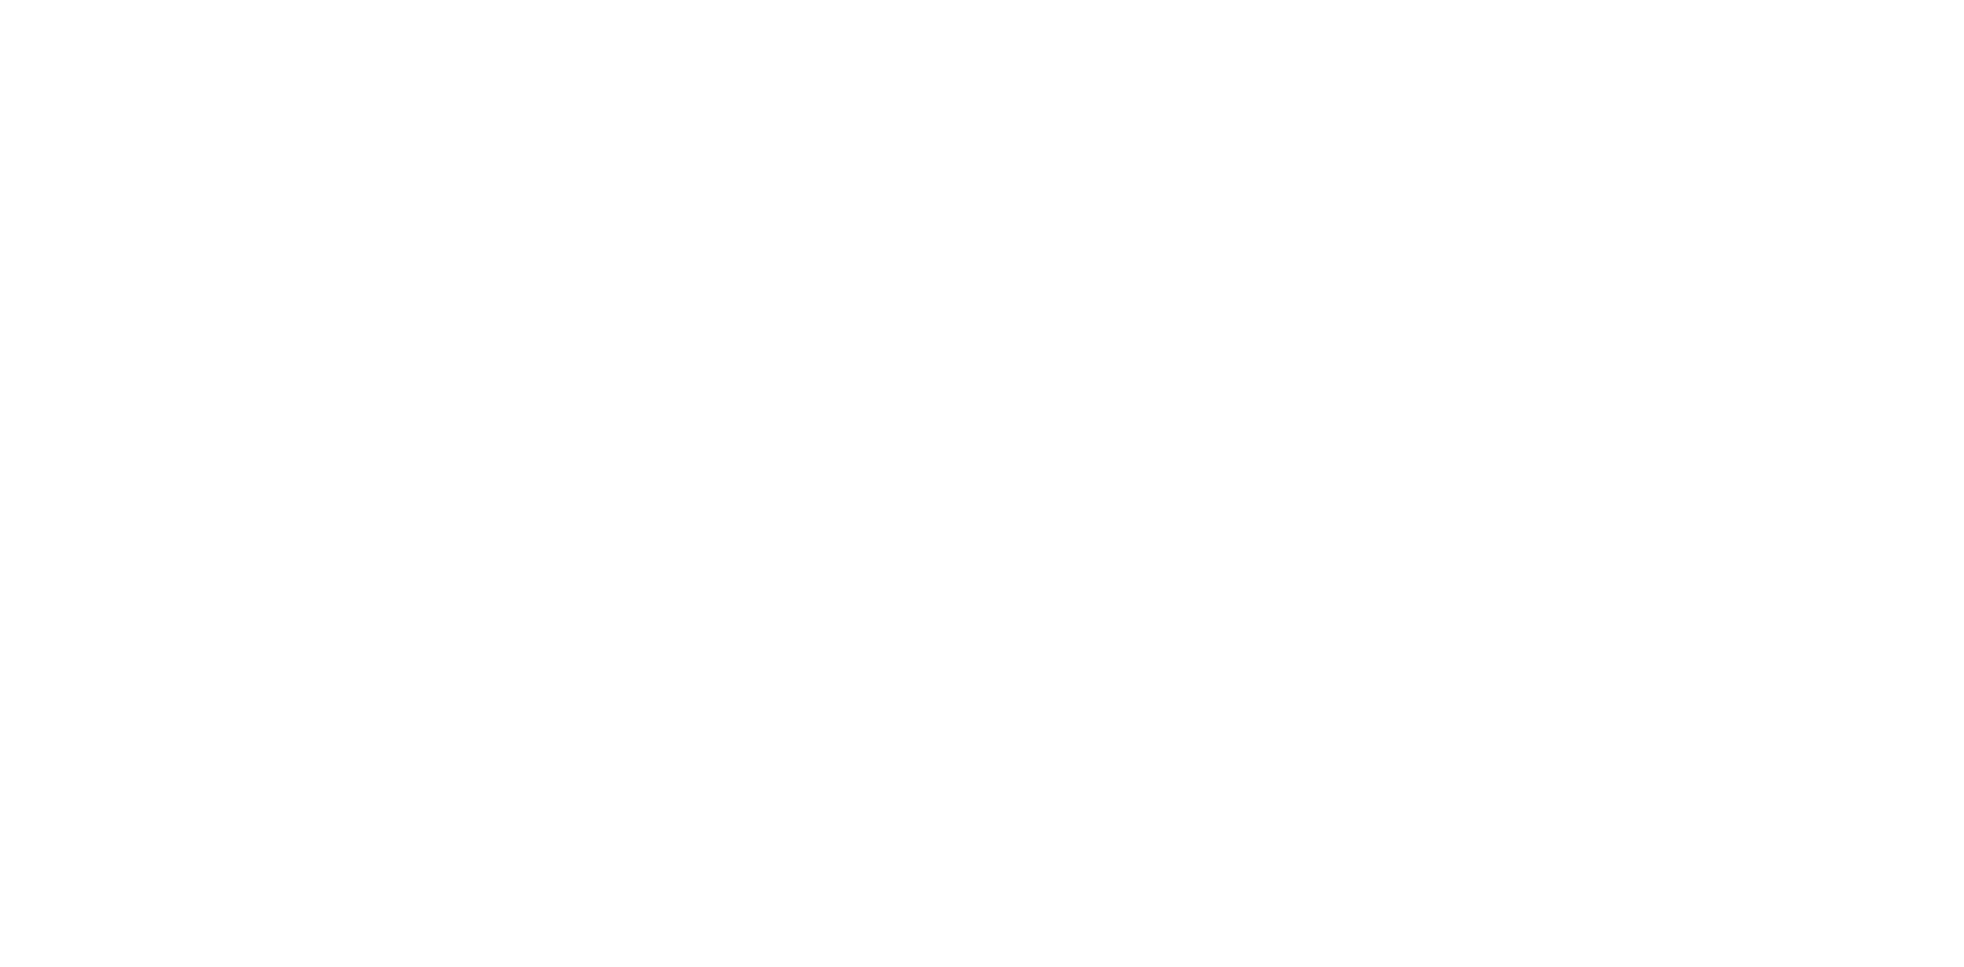 Notarielles